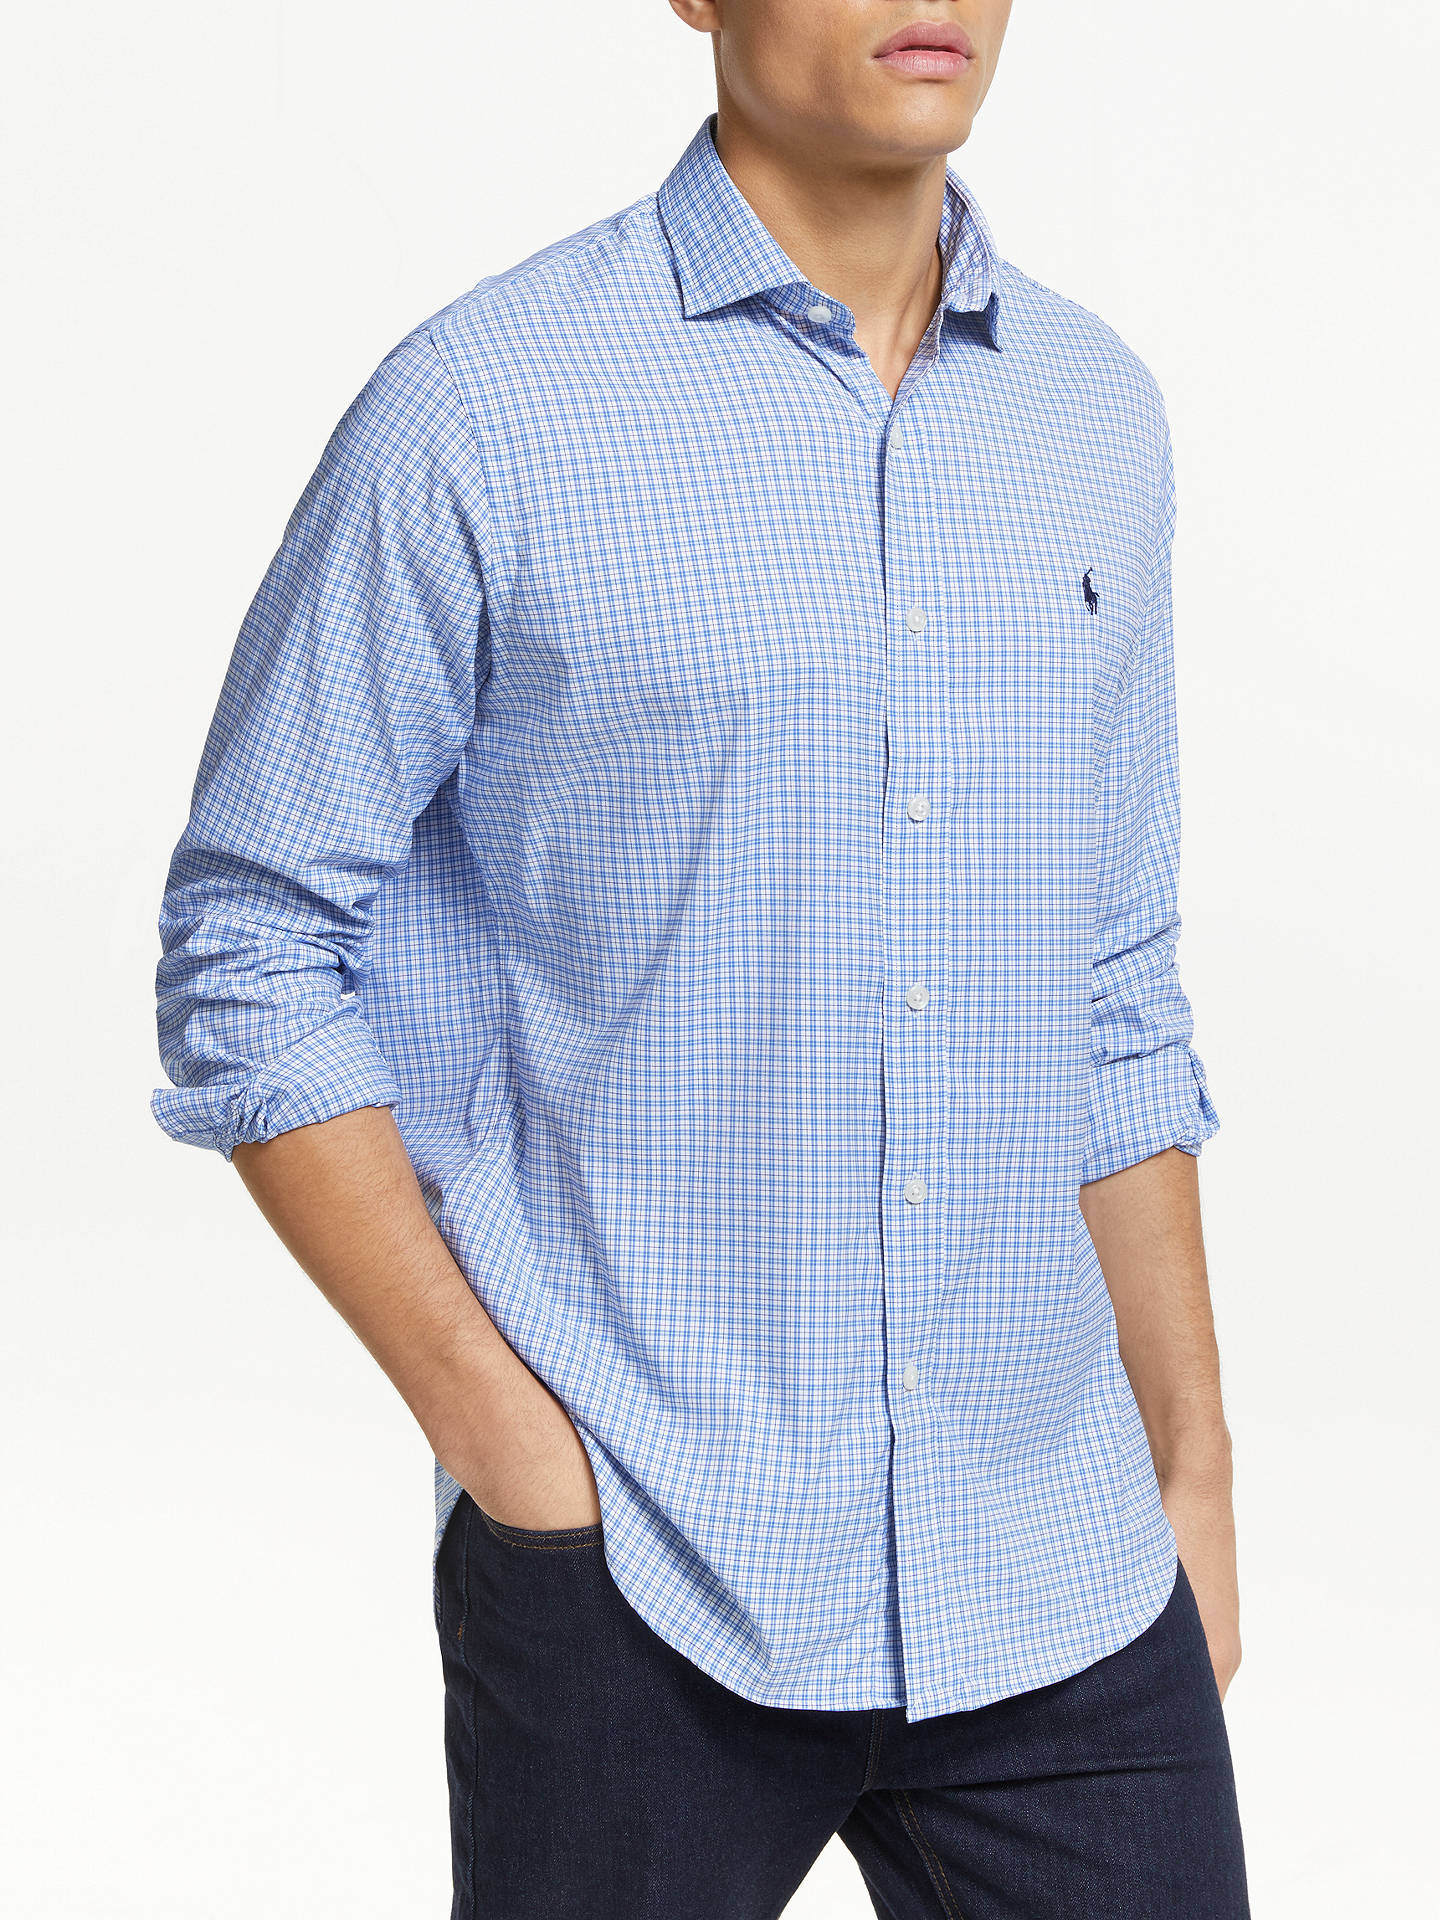 90a2a481c Buy Polo Golf by Ralph Lauren Check Sports Shirt, New England Blue, M  Online ...